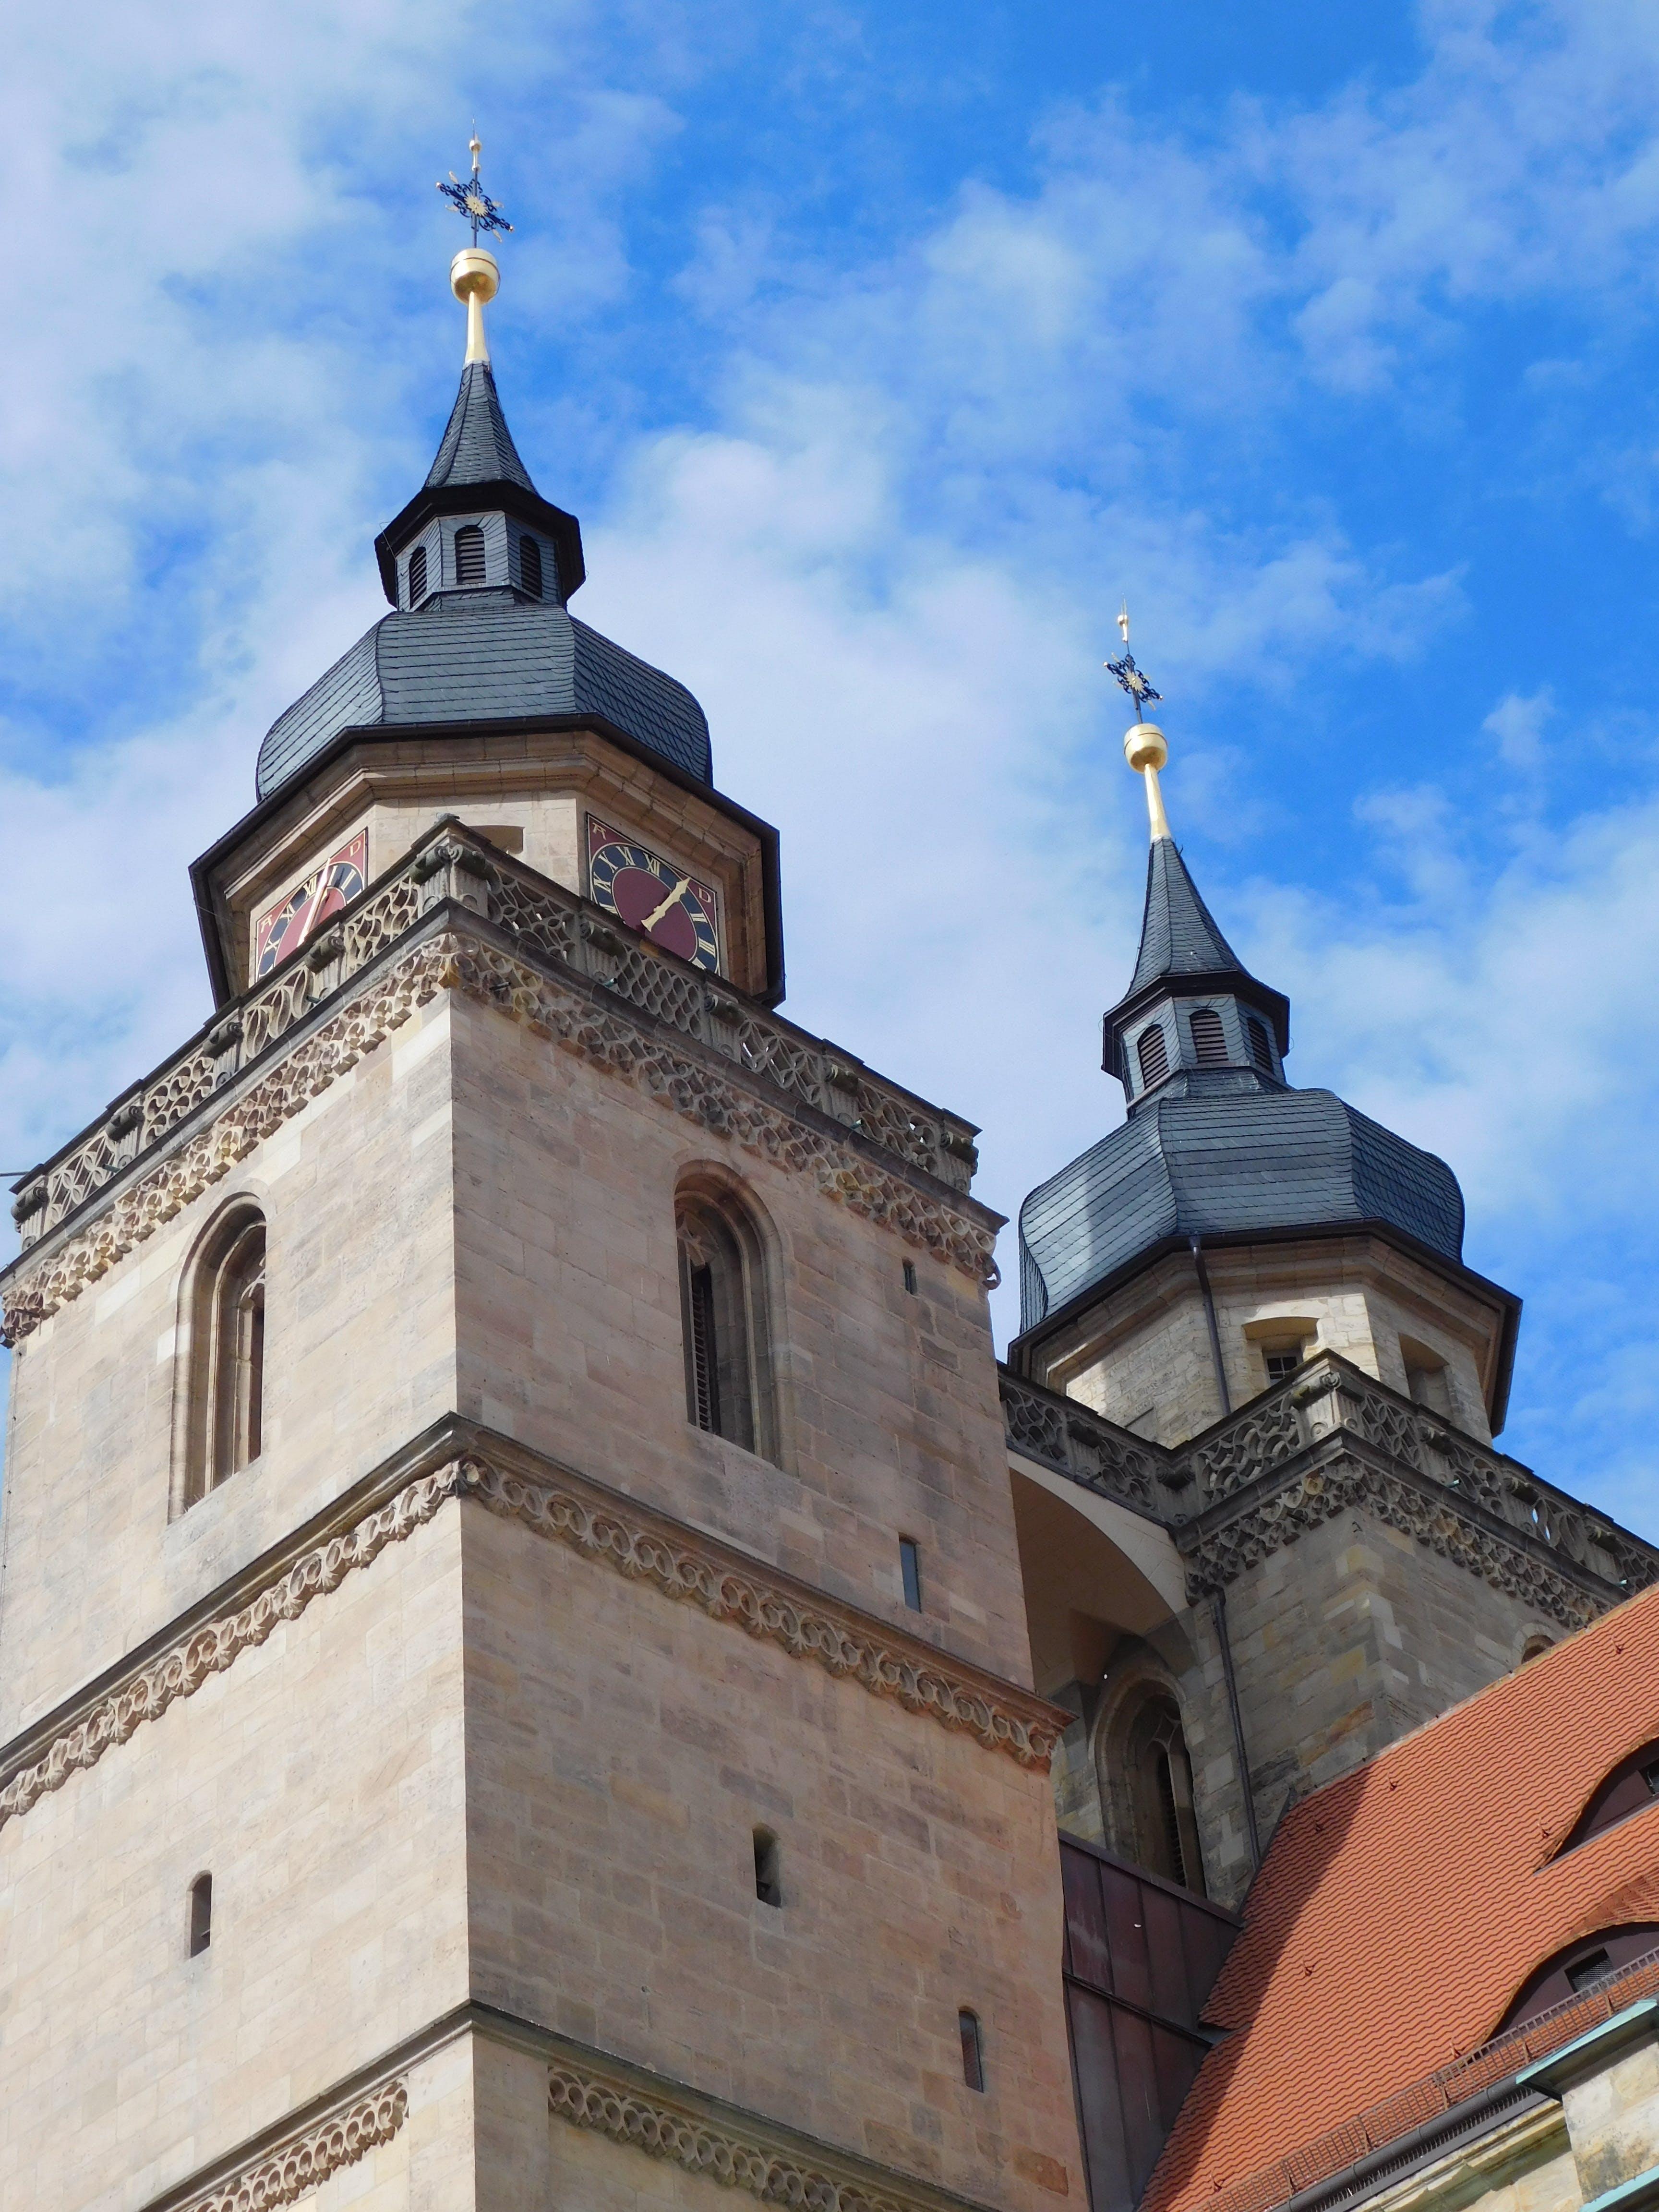 ancient, architecture, Bavaria